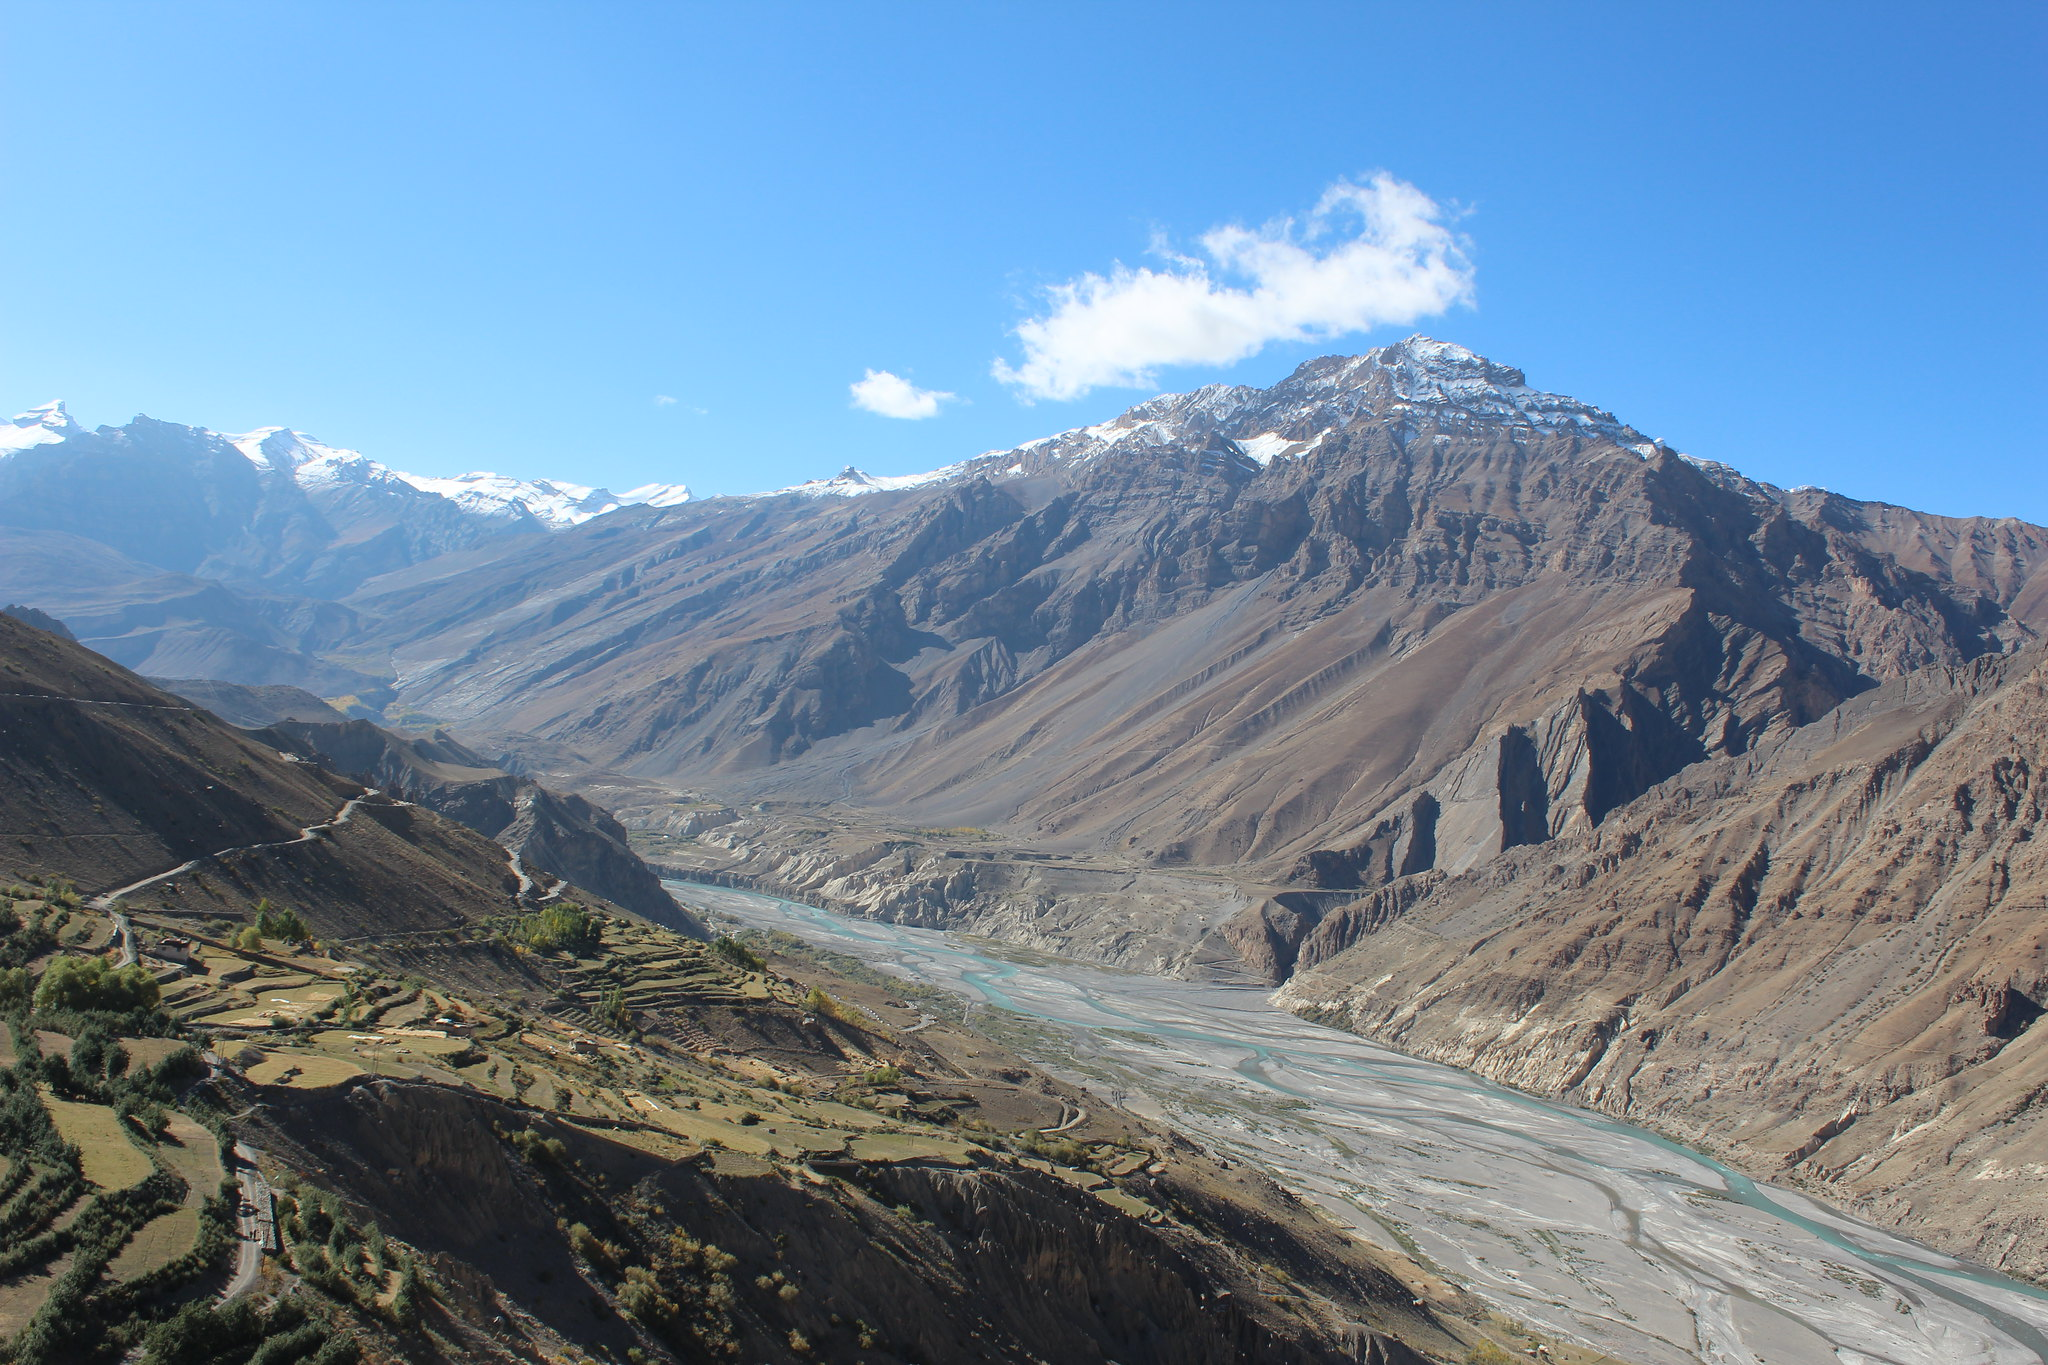 Spiti river from Dhankar Monastery